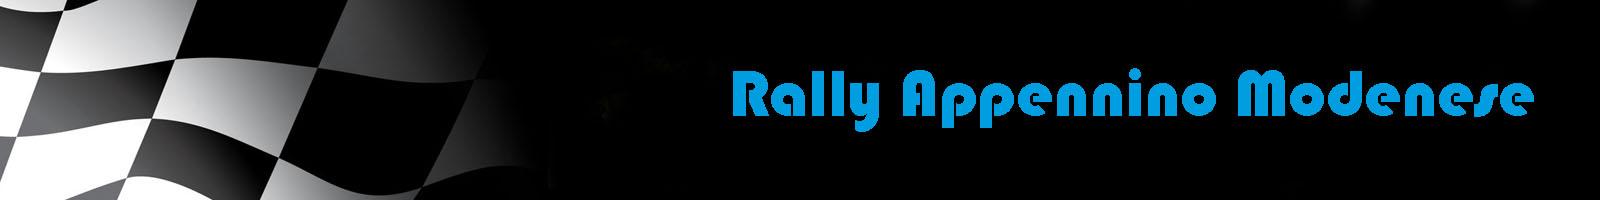 011 Rally Appennino Modenese